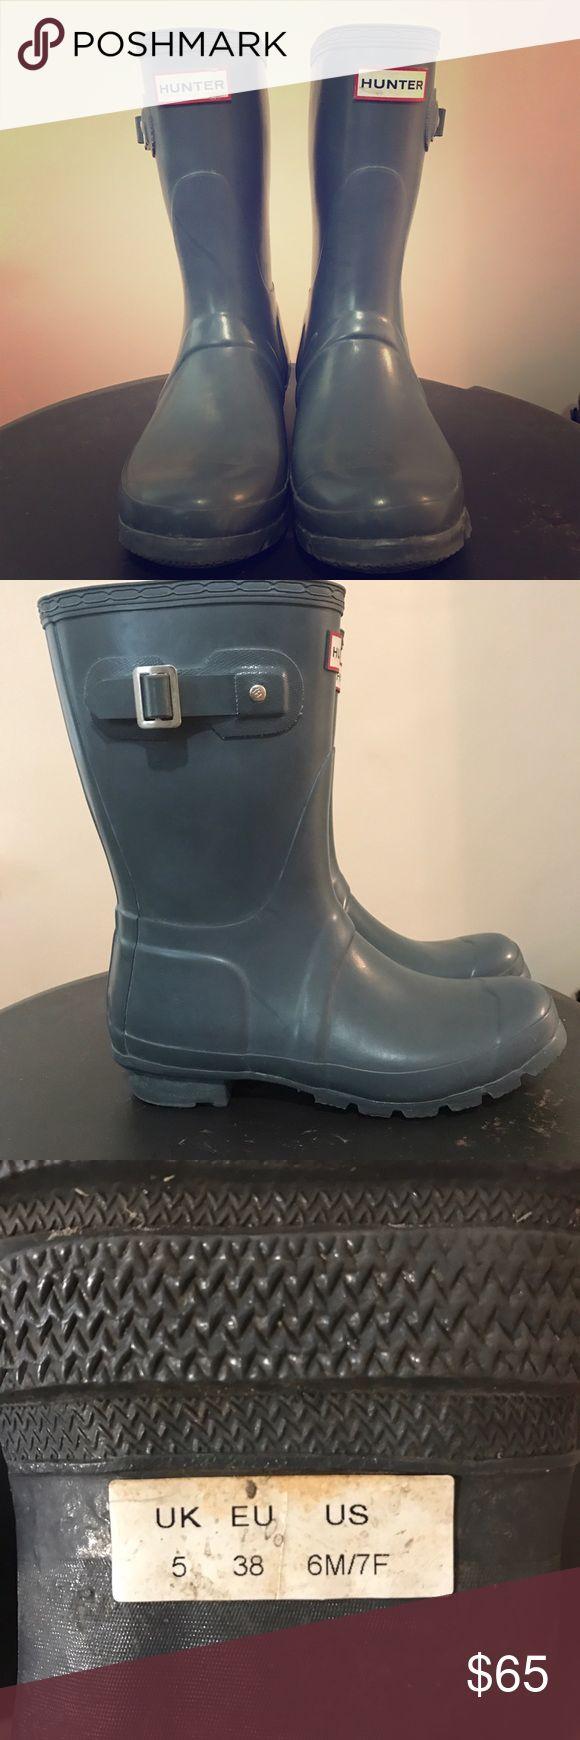 Hunter original short graphite gloss boots Hunter original short graphite gloss boots Hunter Boots Shoes Winter & Rain Boots